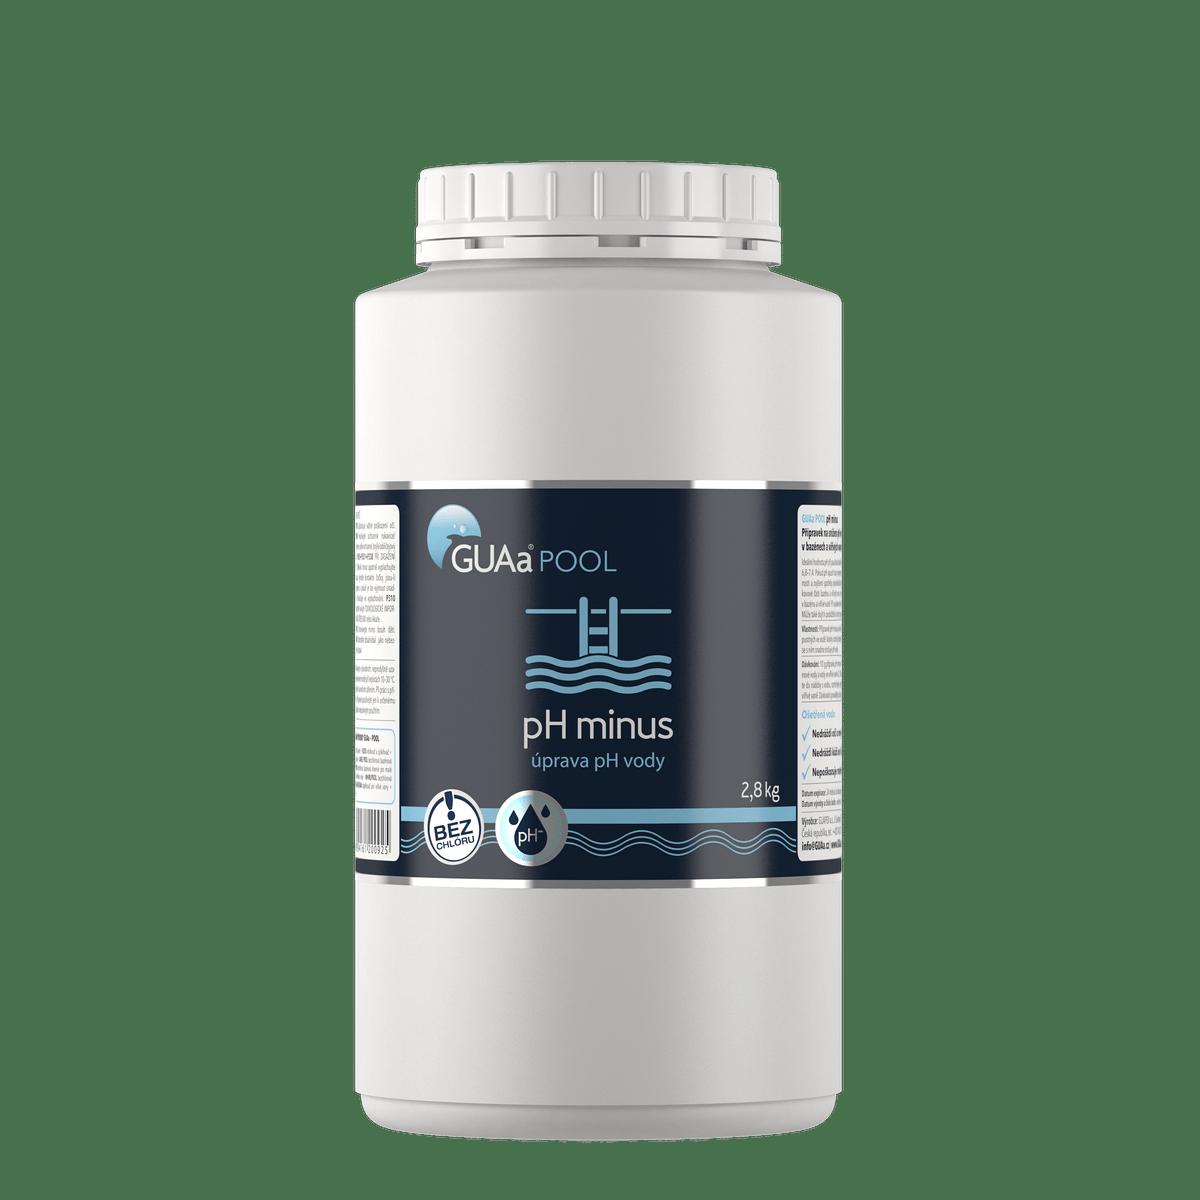 GUAa POOL pH minus 2,8 kg - úprava pH vody